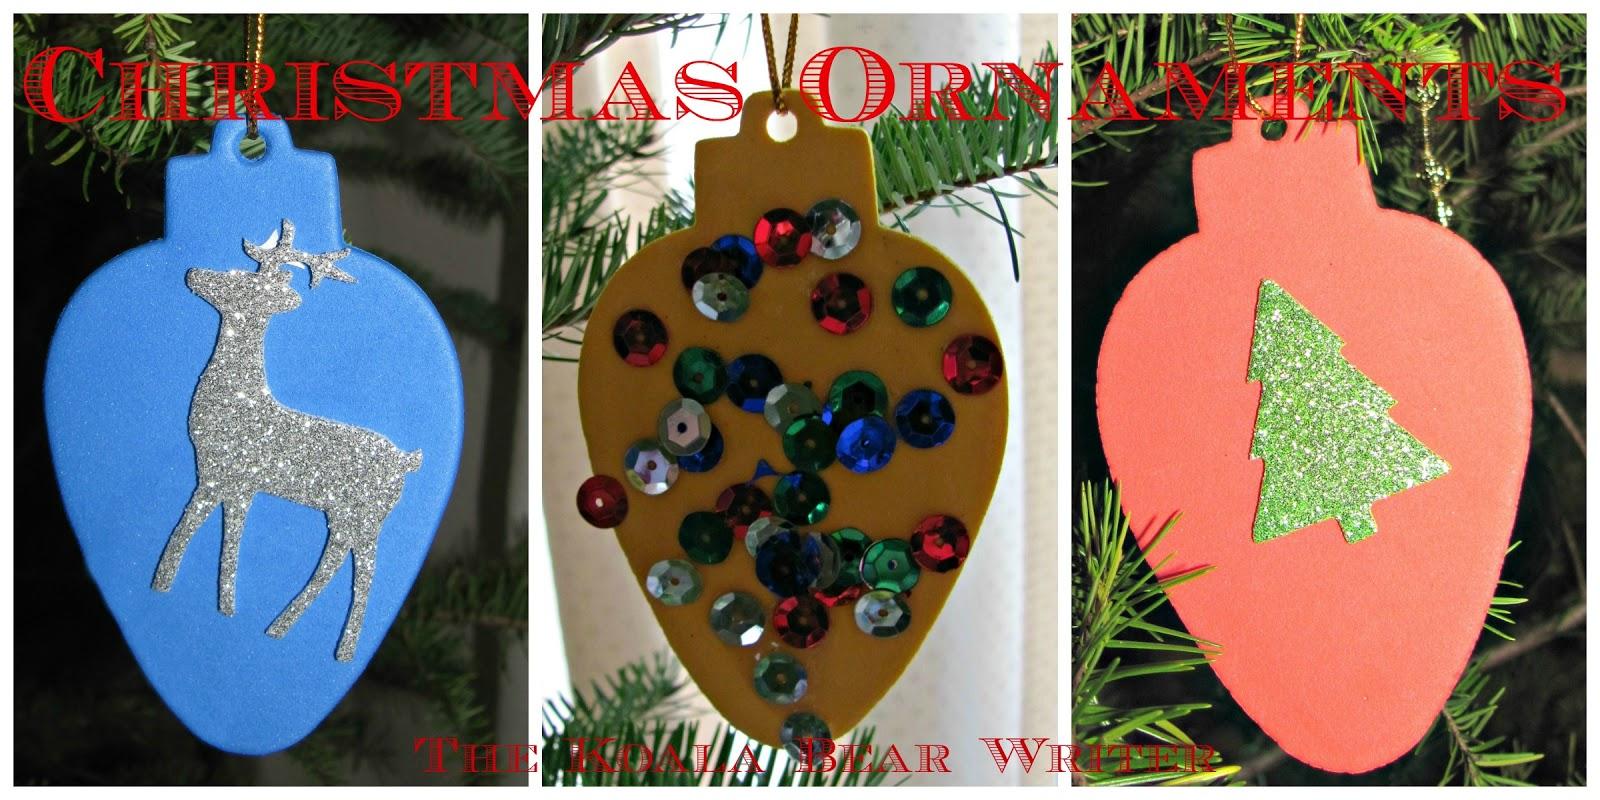 Christmas Ornament Craft Ideas Preschoolers : Christmas crafts for toddlers and preschoolers the koala mom